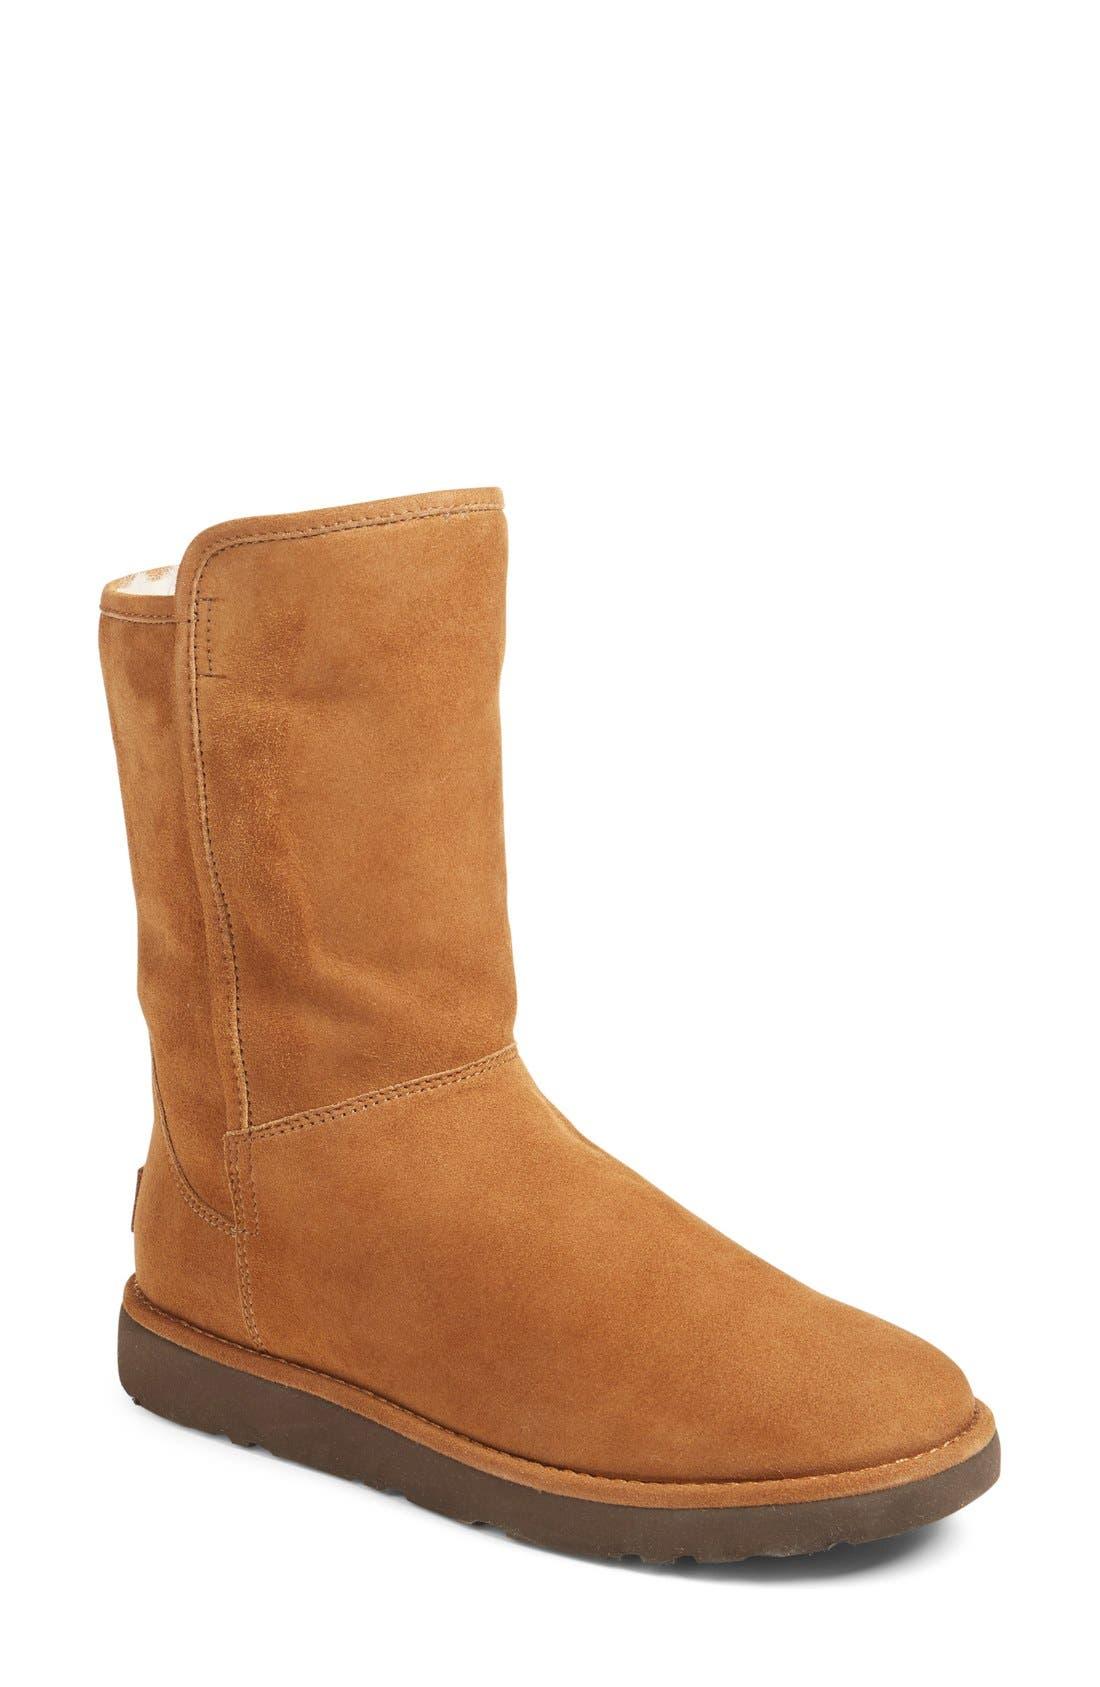 Ugg Abree Ii Short Boot